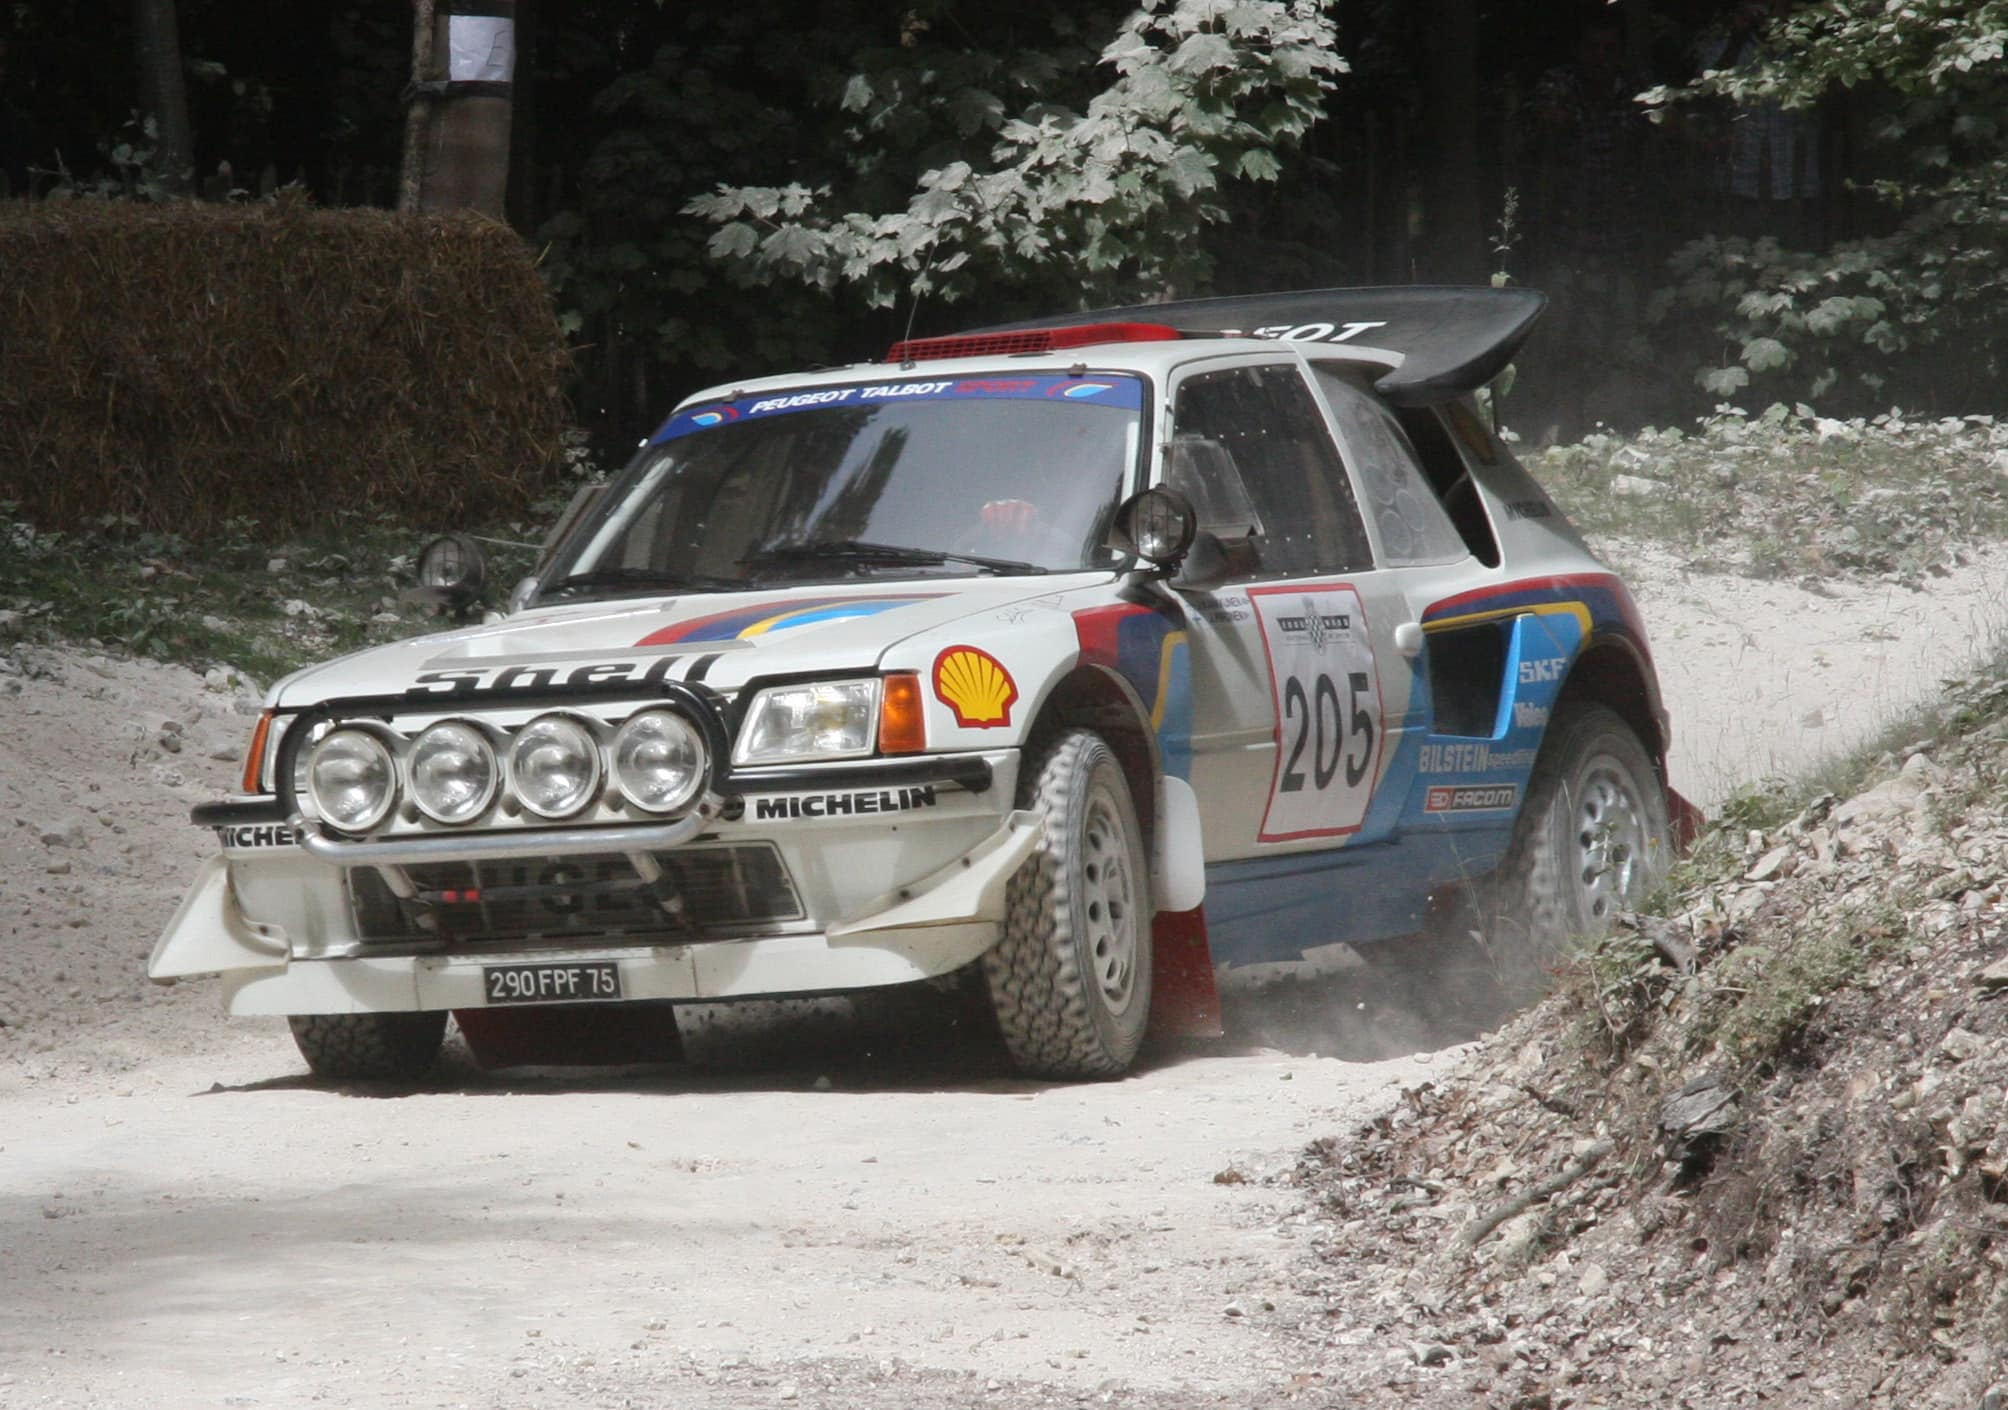 Peugeot_205_T16_-_Flickr_-_exfordy